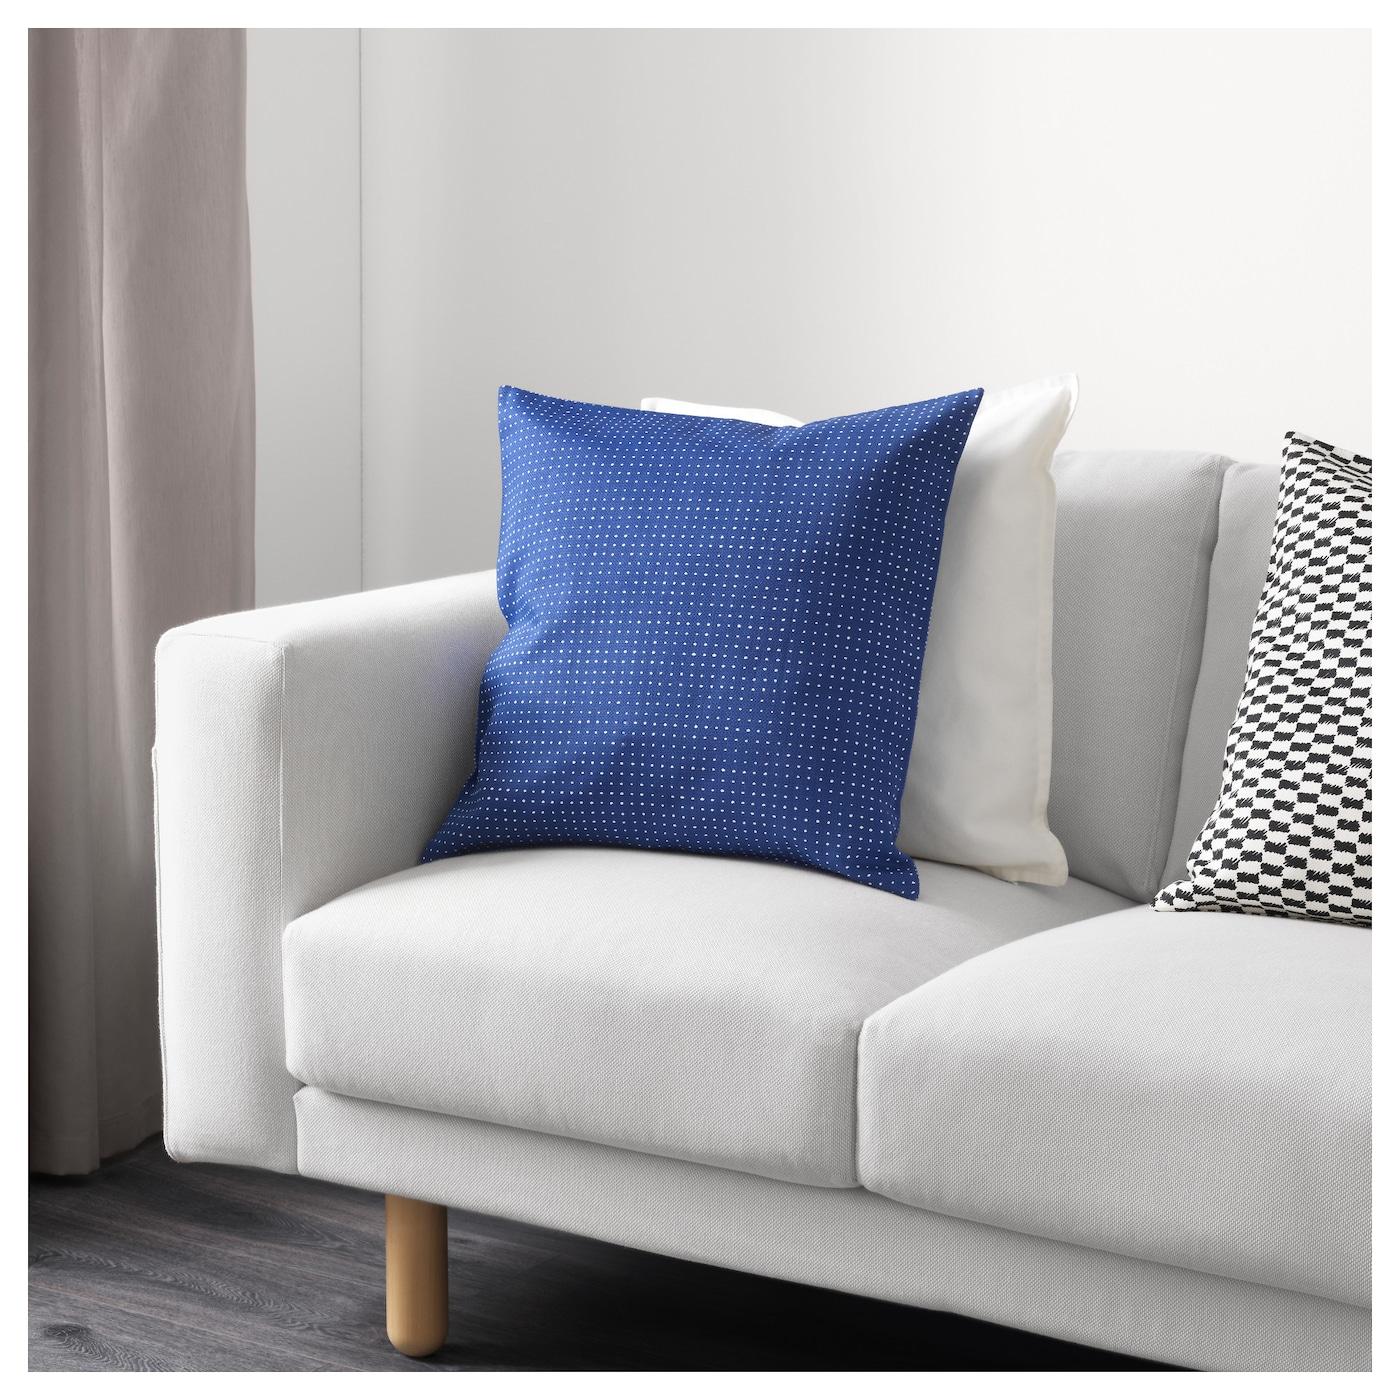 ypperlig housse de coussin bleu pois 50 x 50 cm ikea. Black Bedroom Furniture Sets. Home Design Ideas